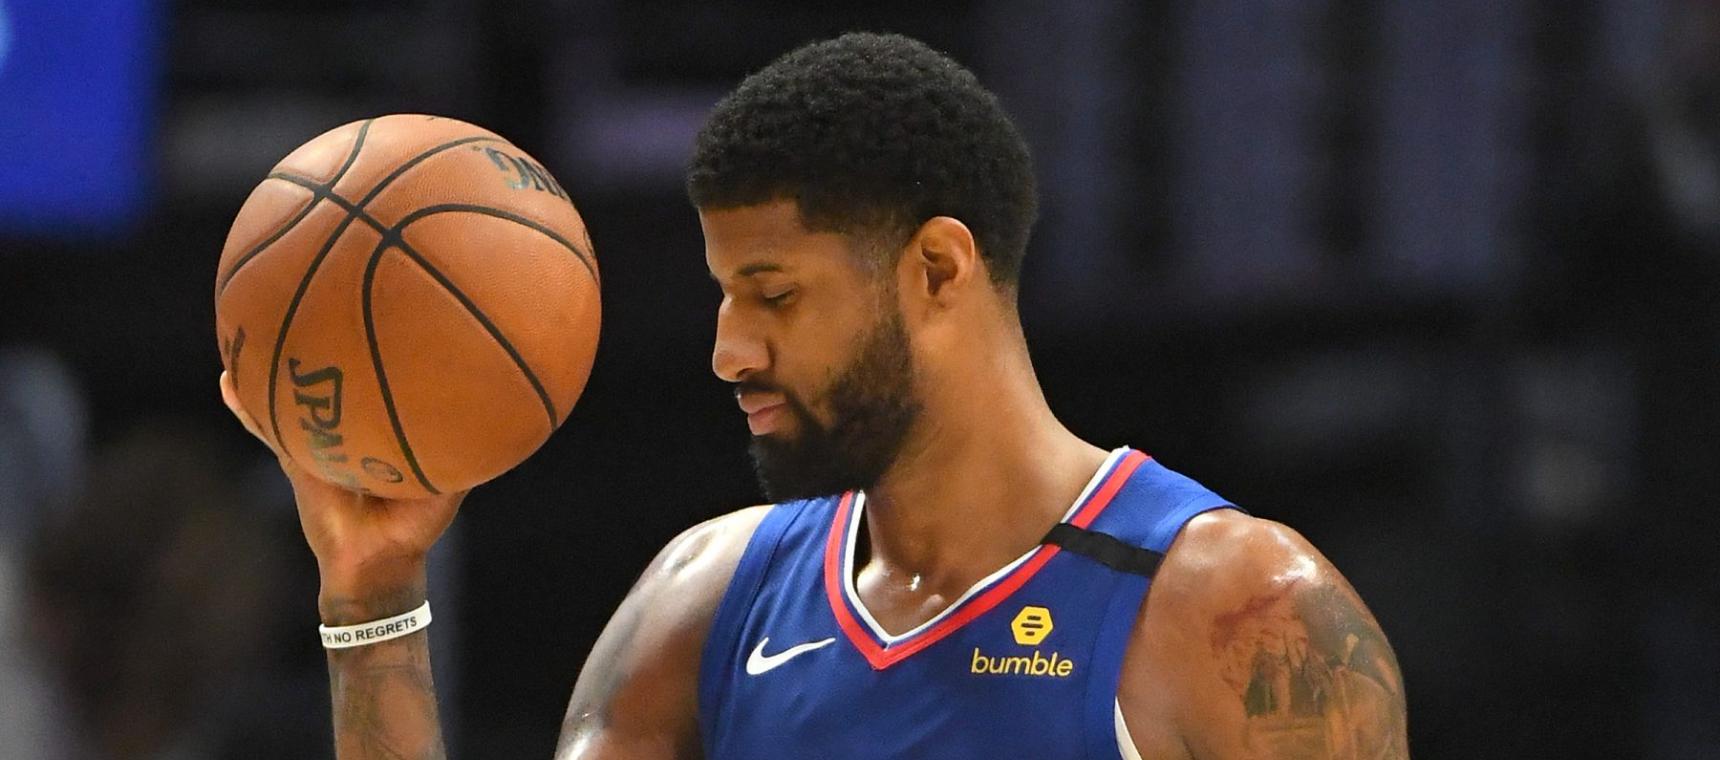 Бостон Селтикс – Лос-Анджелес Клипперс: прогноз на матч 14 февраля, НБА. Прогнозы и ставки экспертов на баскетбол от Betting Insider